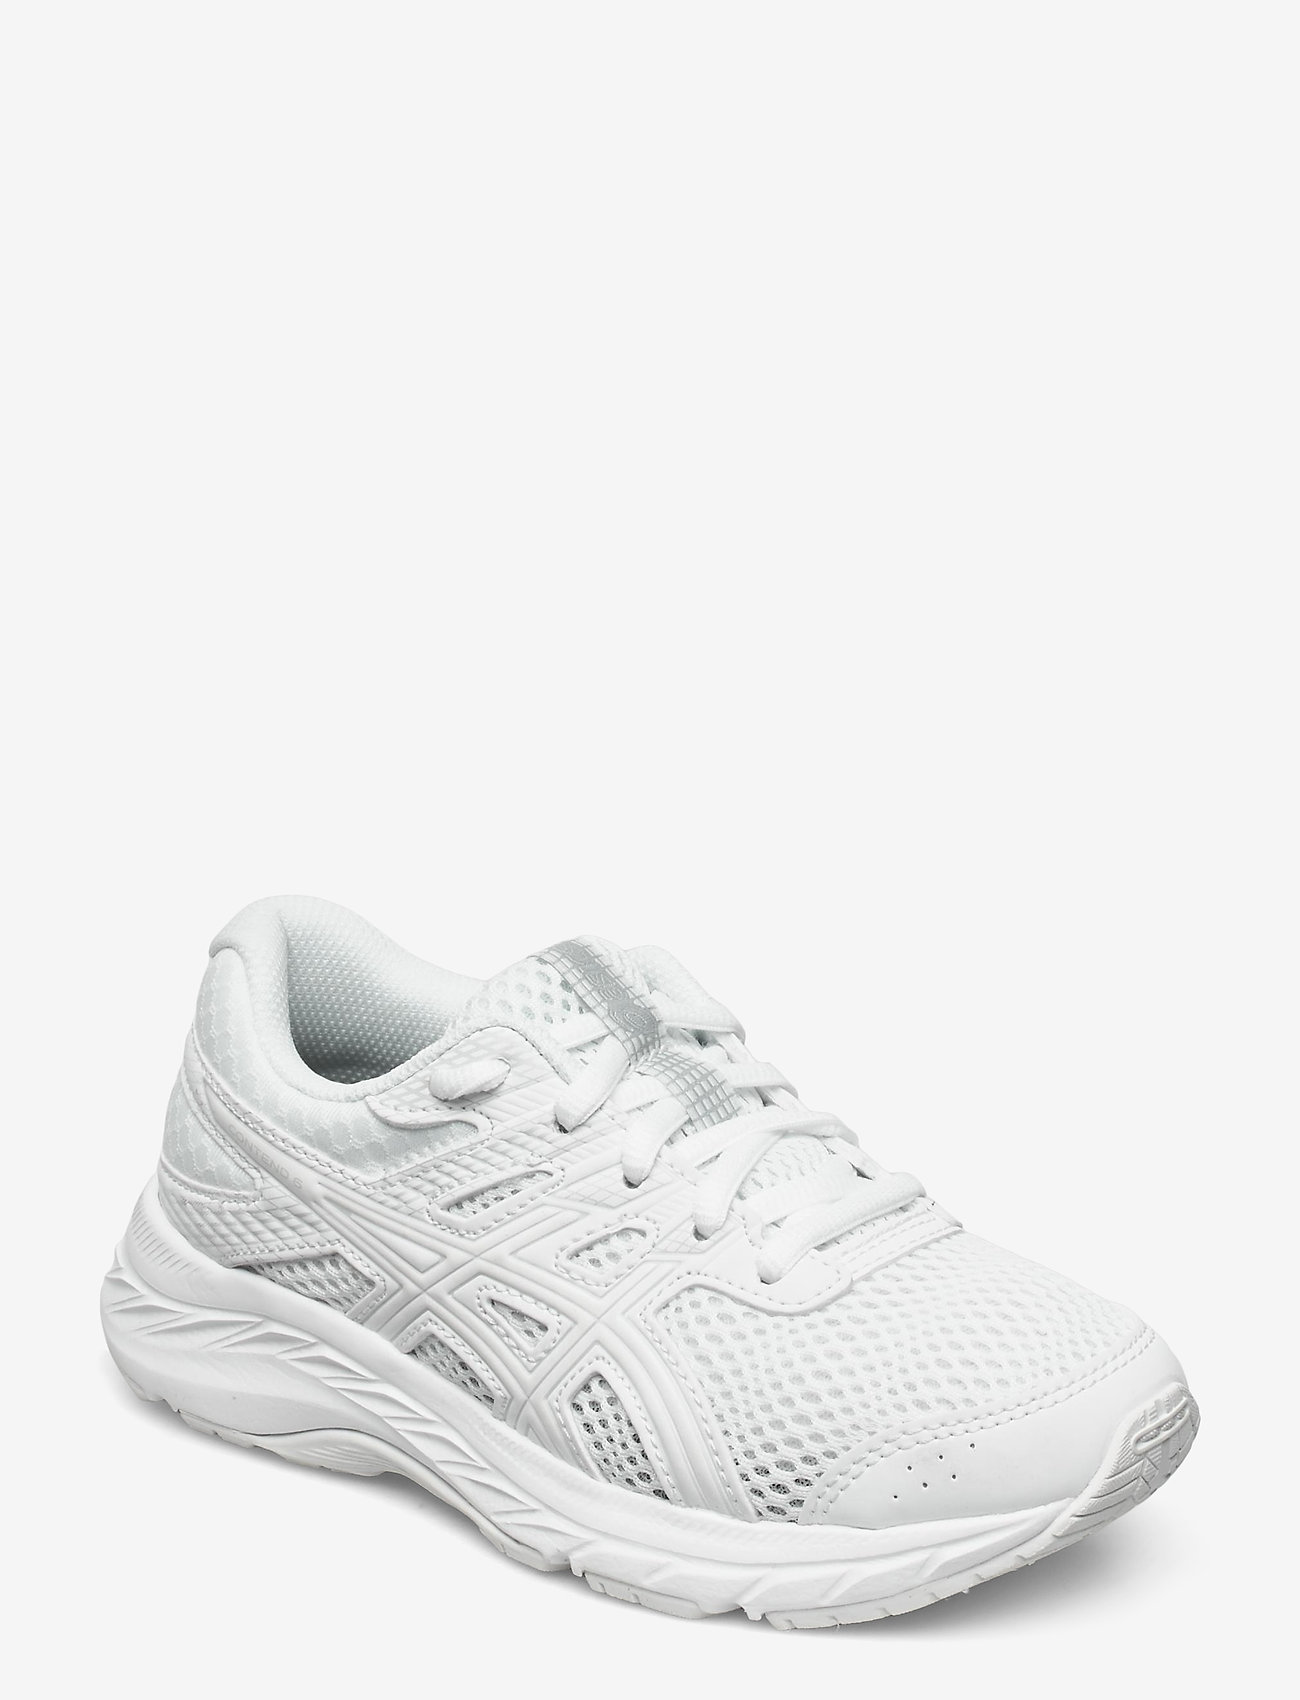 Asics - CONTEND 6 GS - trainingsschuhe - white/white - 0